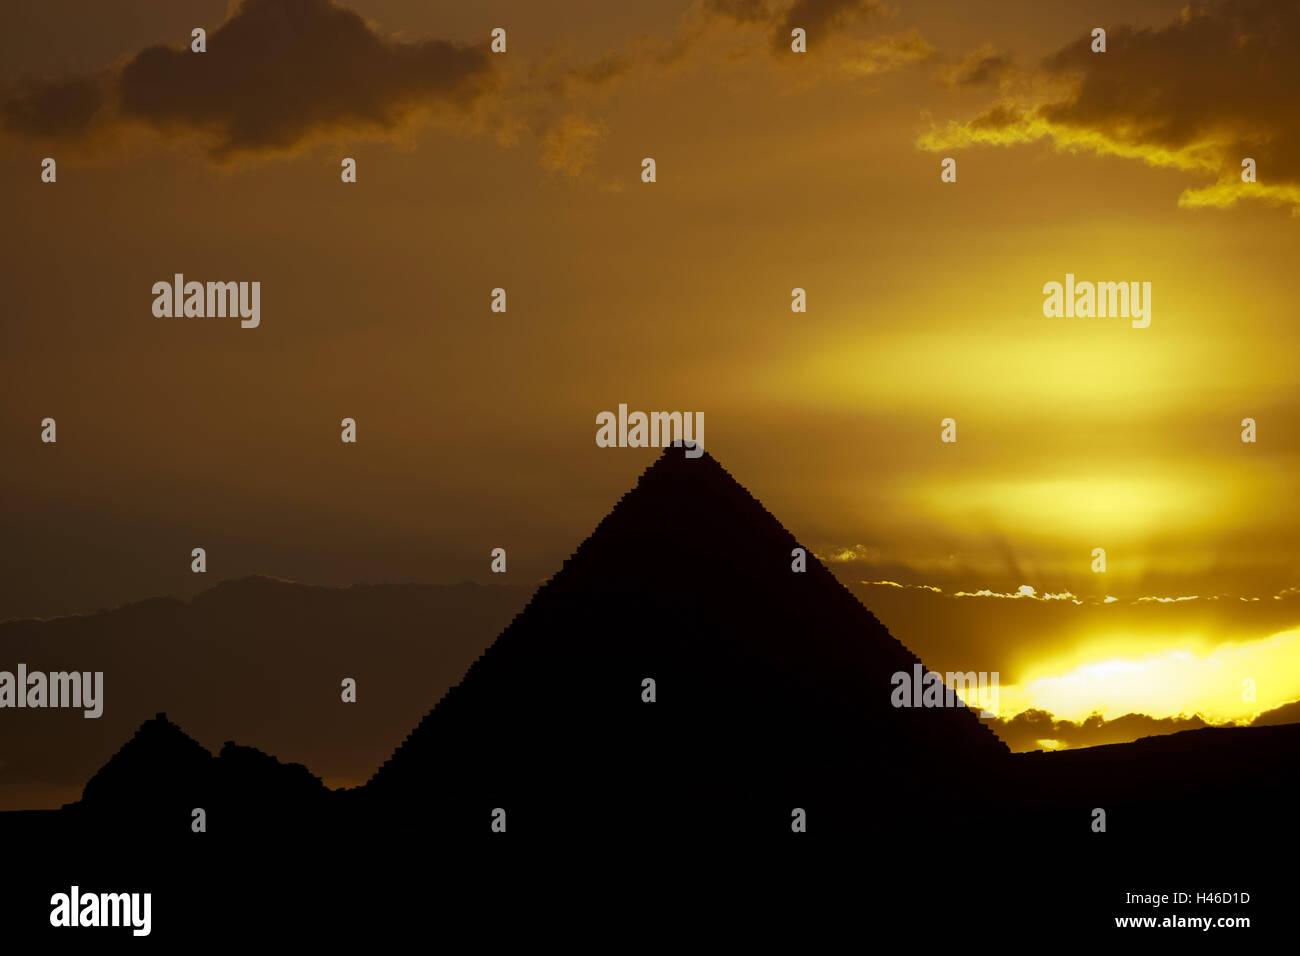 Egypt, Cairo, Gizeh, sundown, pyramids Gizeh, - Stock Image